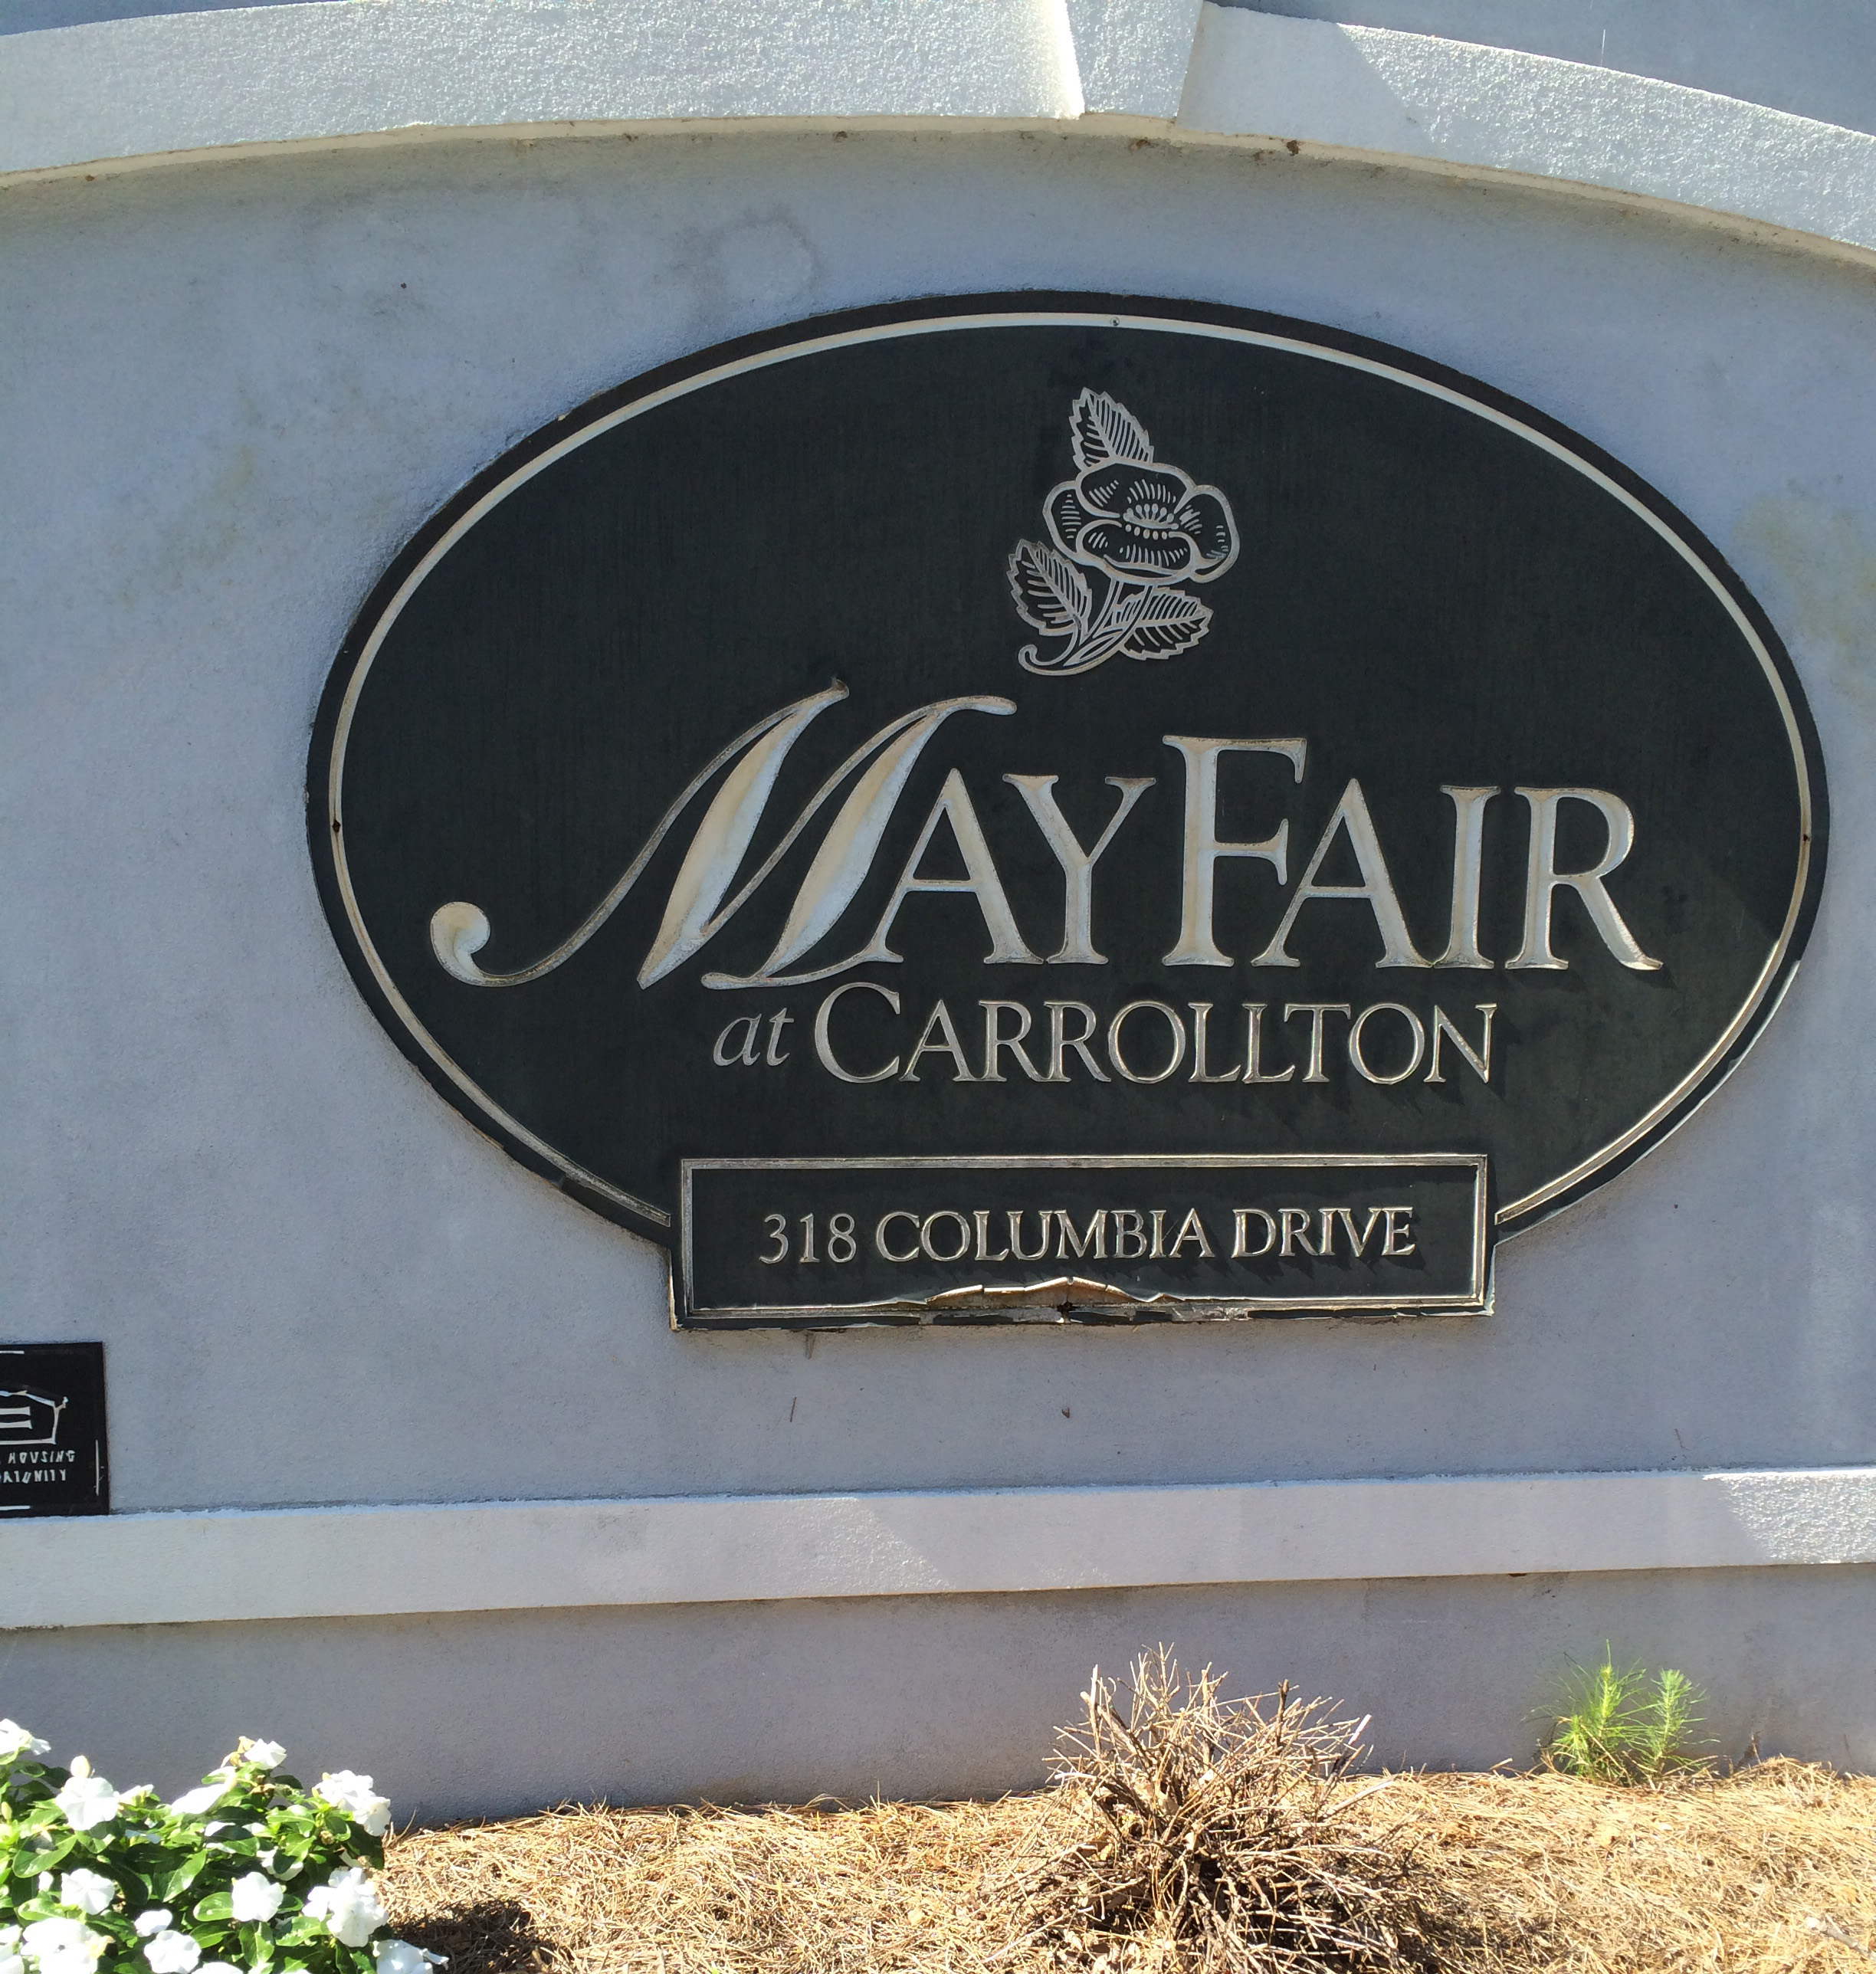 Mayfair of Carrollton image